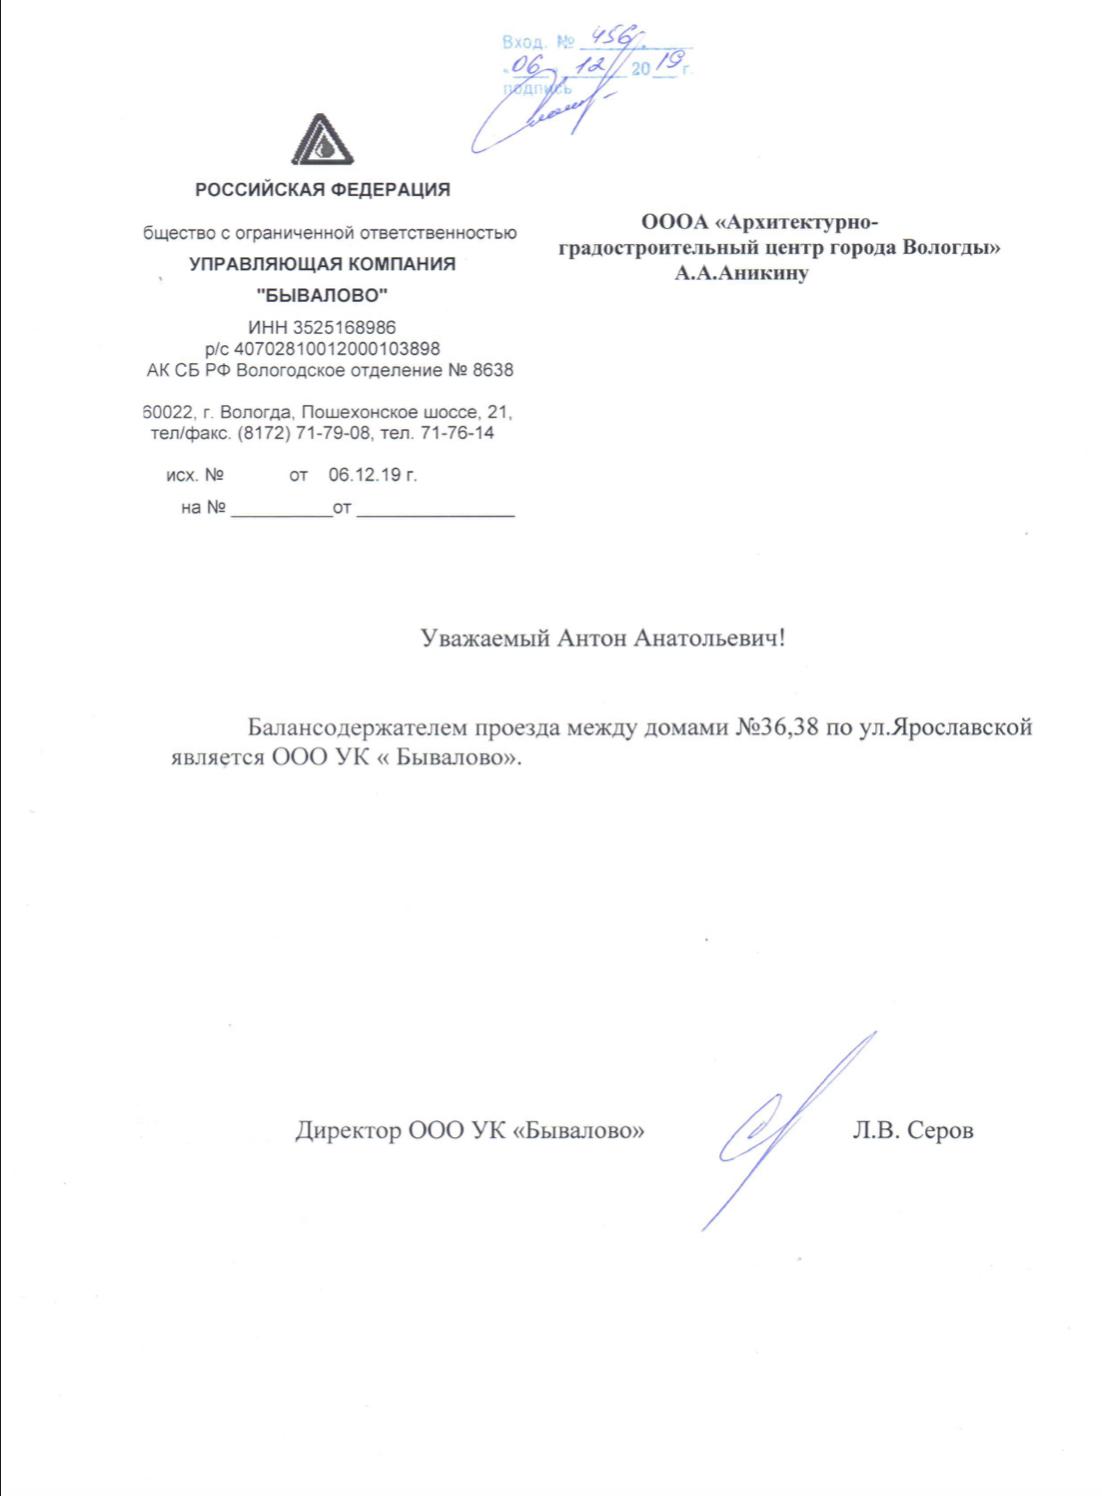 Сад памяти на Ярославской. Вологда (2).jpg